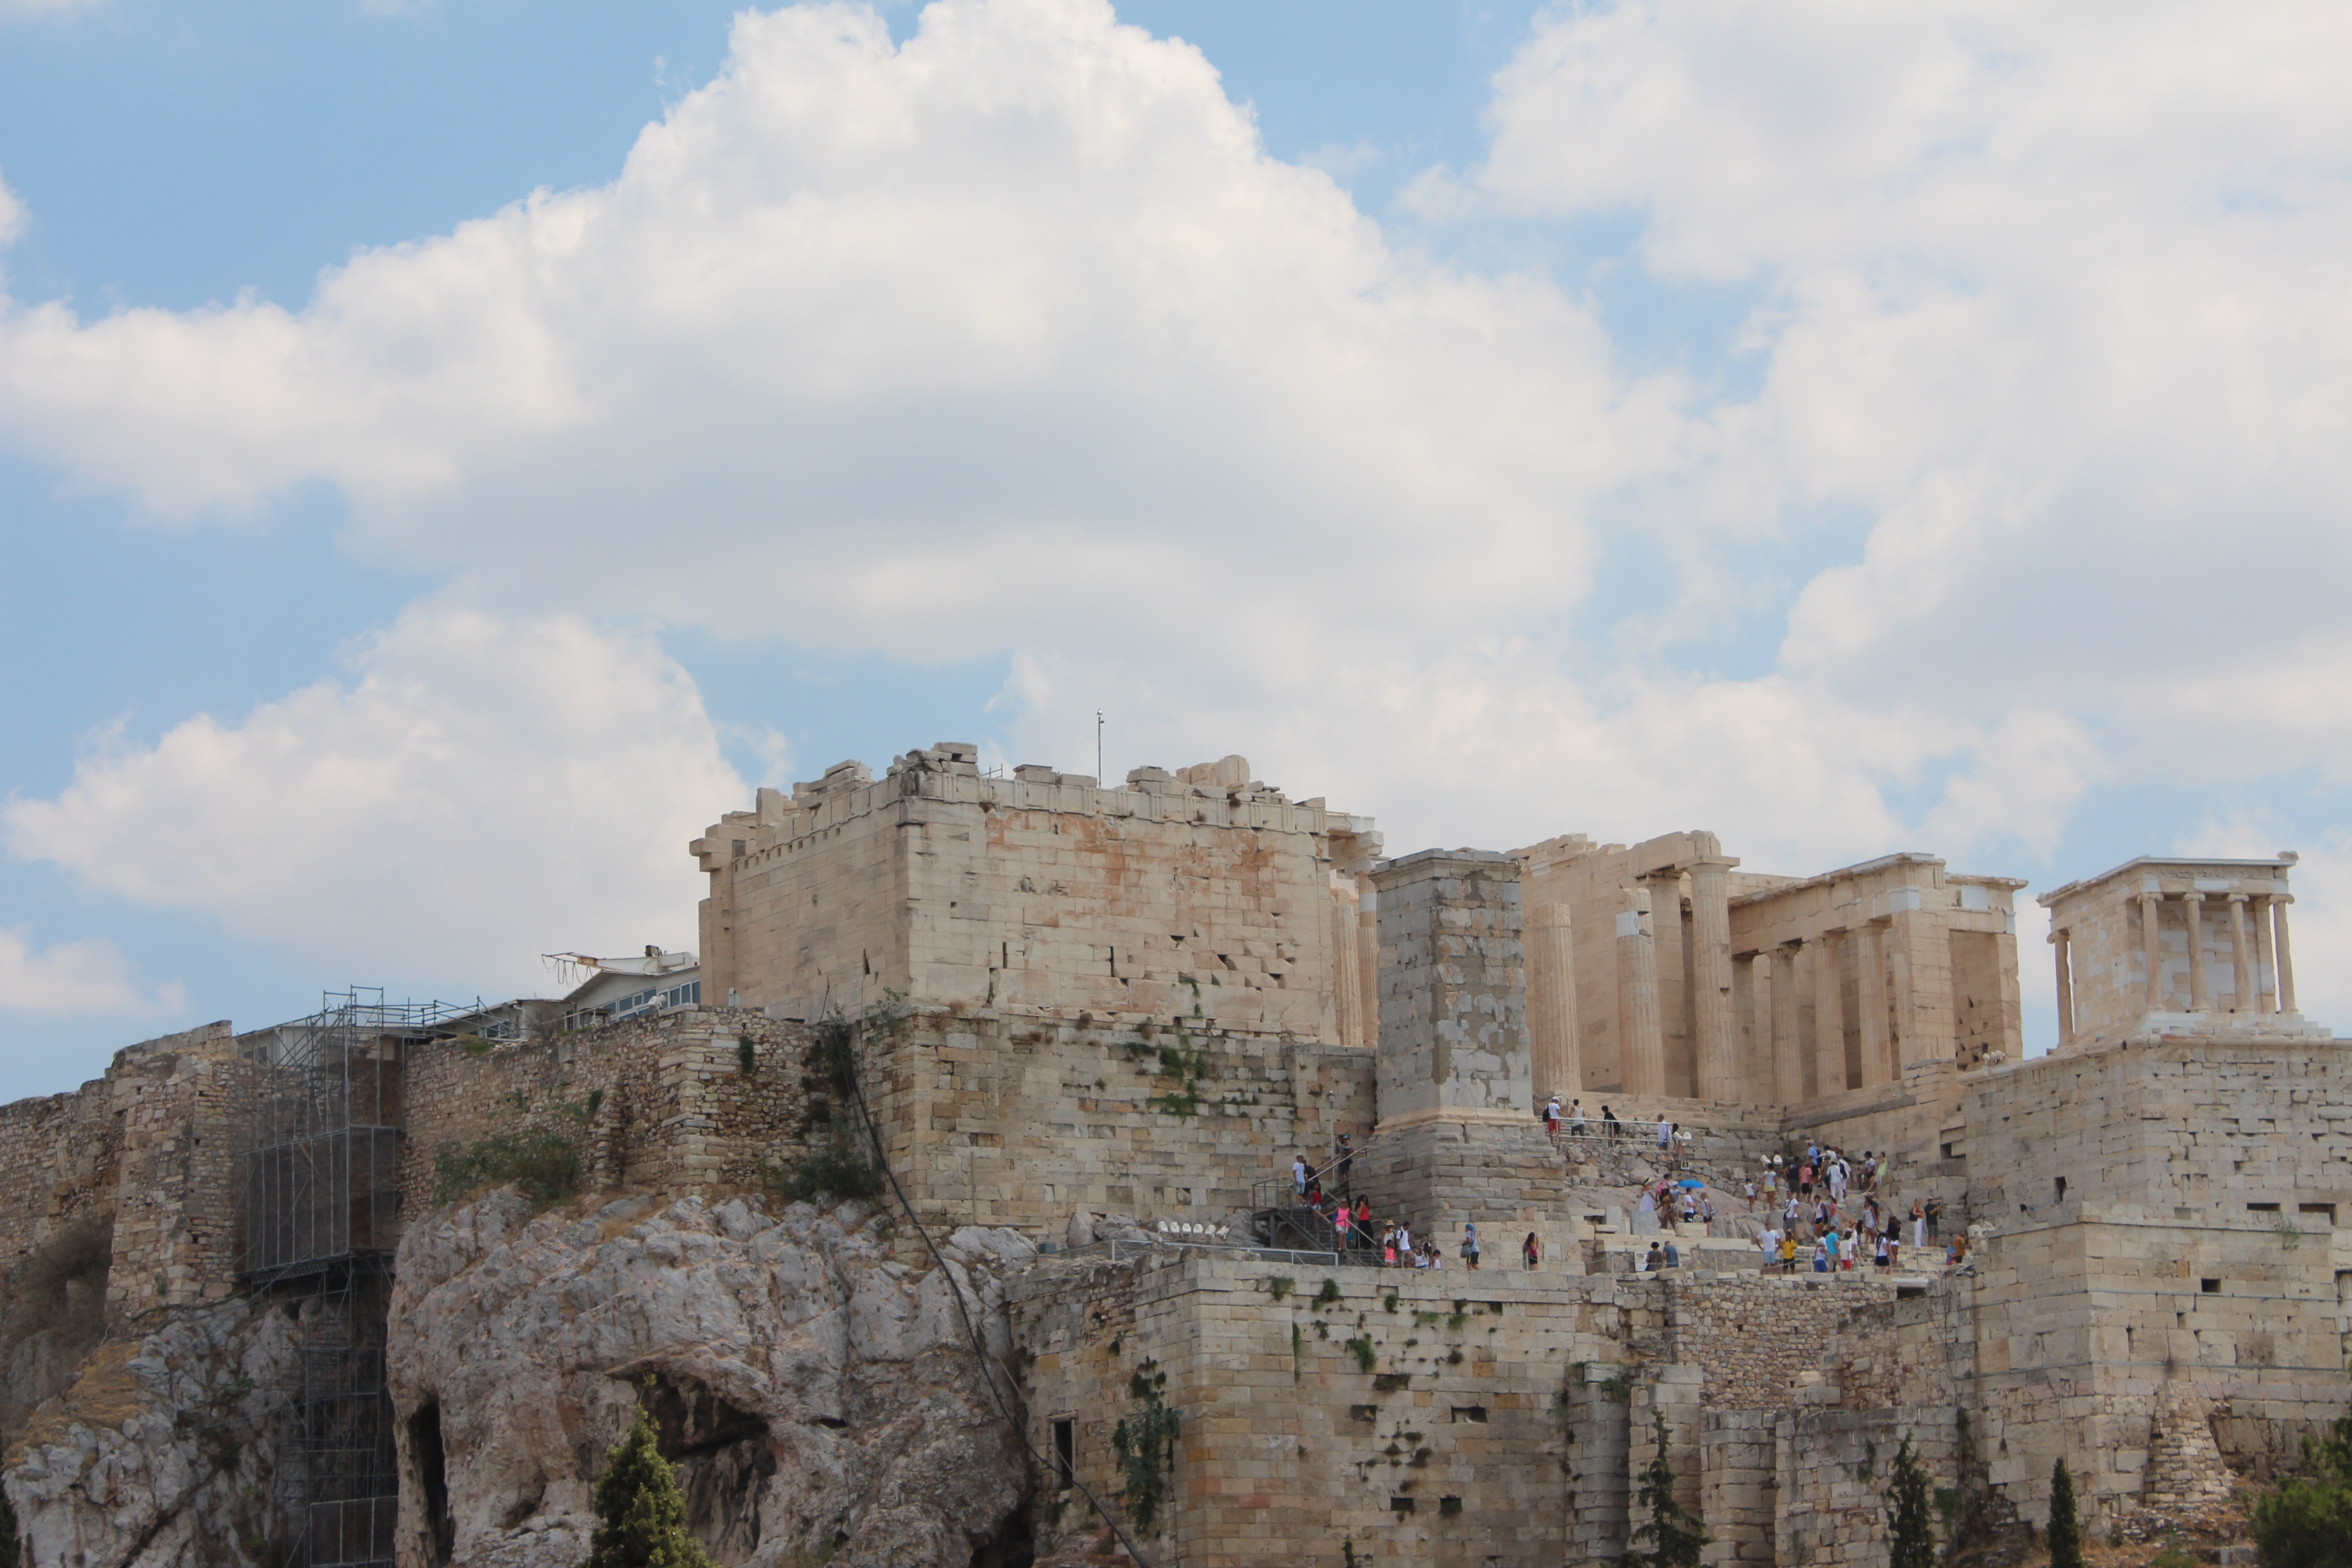 Propylaea of the Acropolis in Athens, Greece